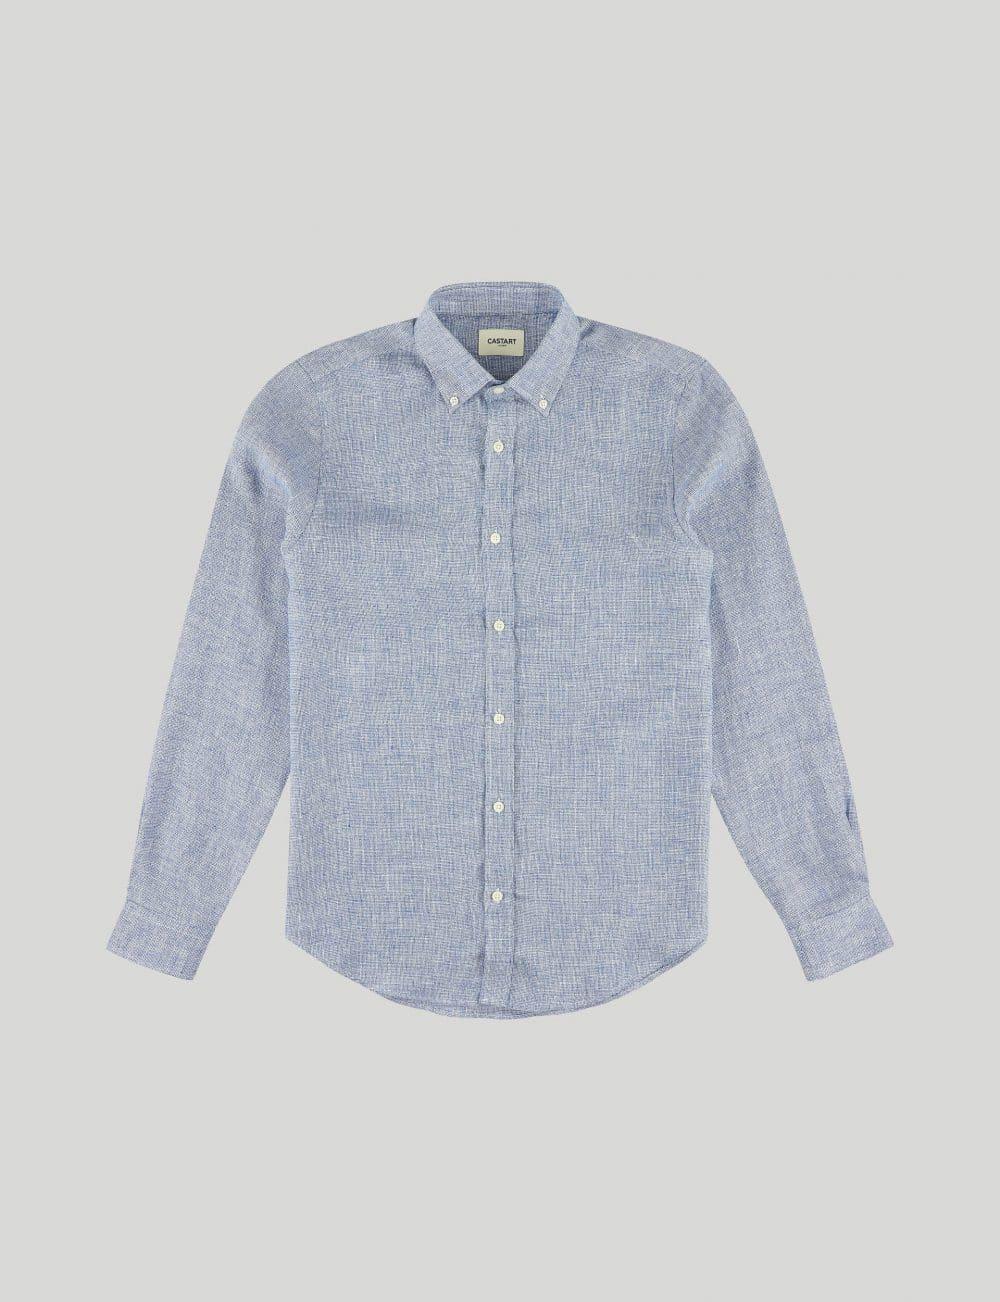 Castart - Devilshead LS Shirt - Middle Blue